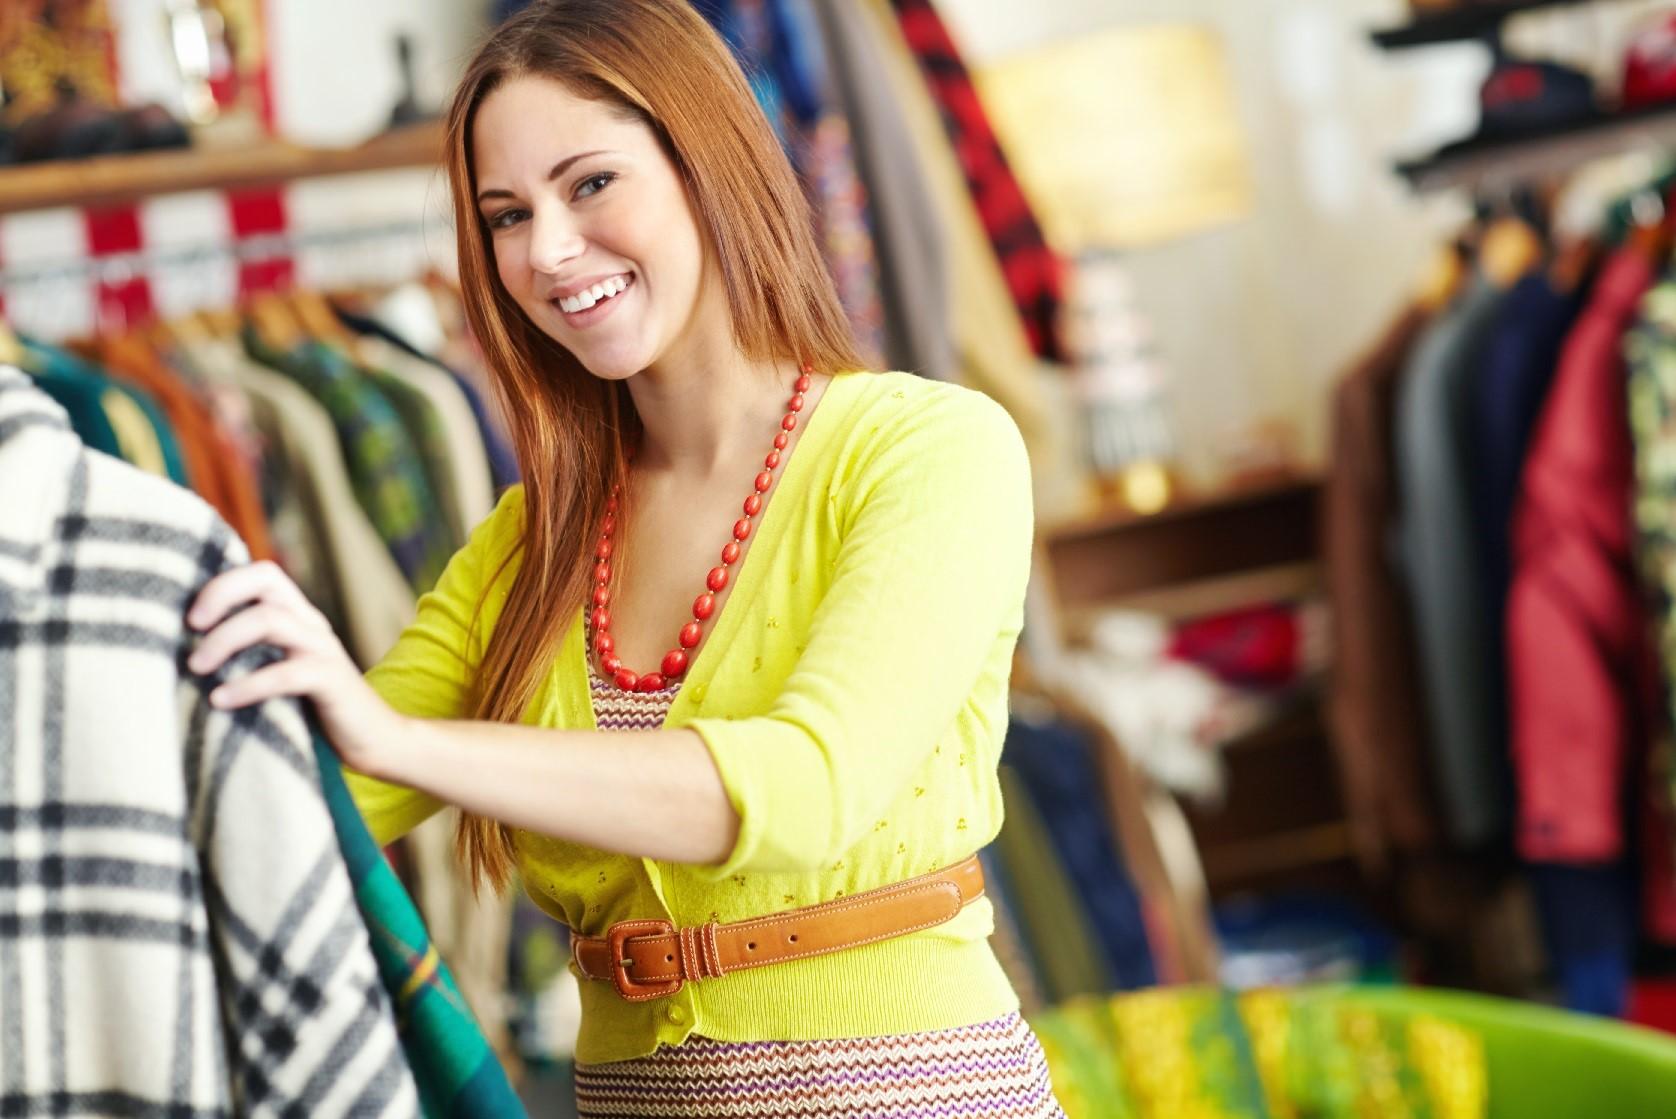 Melbourne Vintage Clothing Shopping Tour